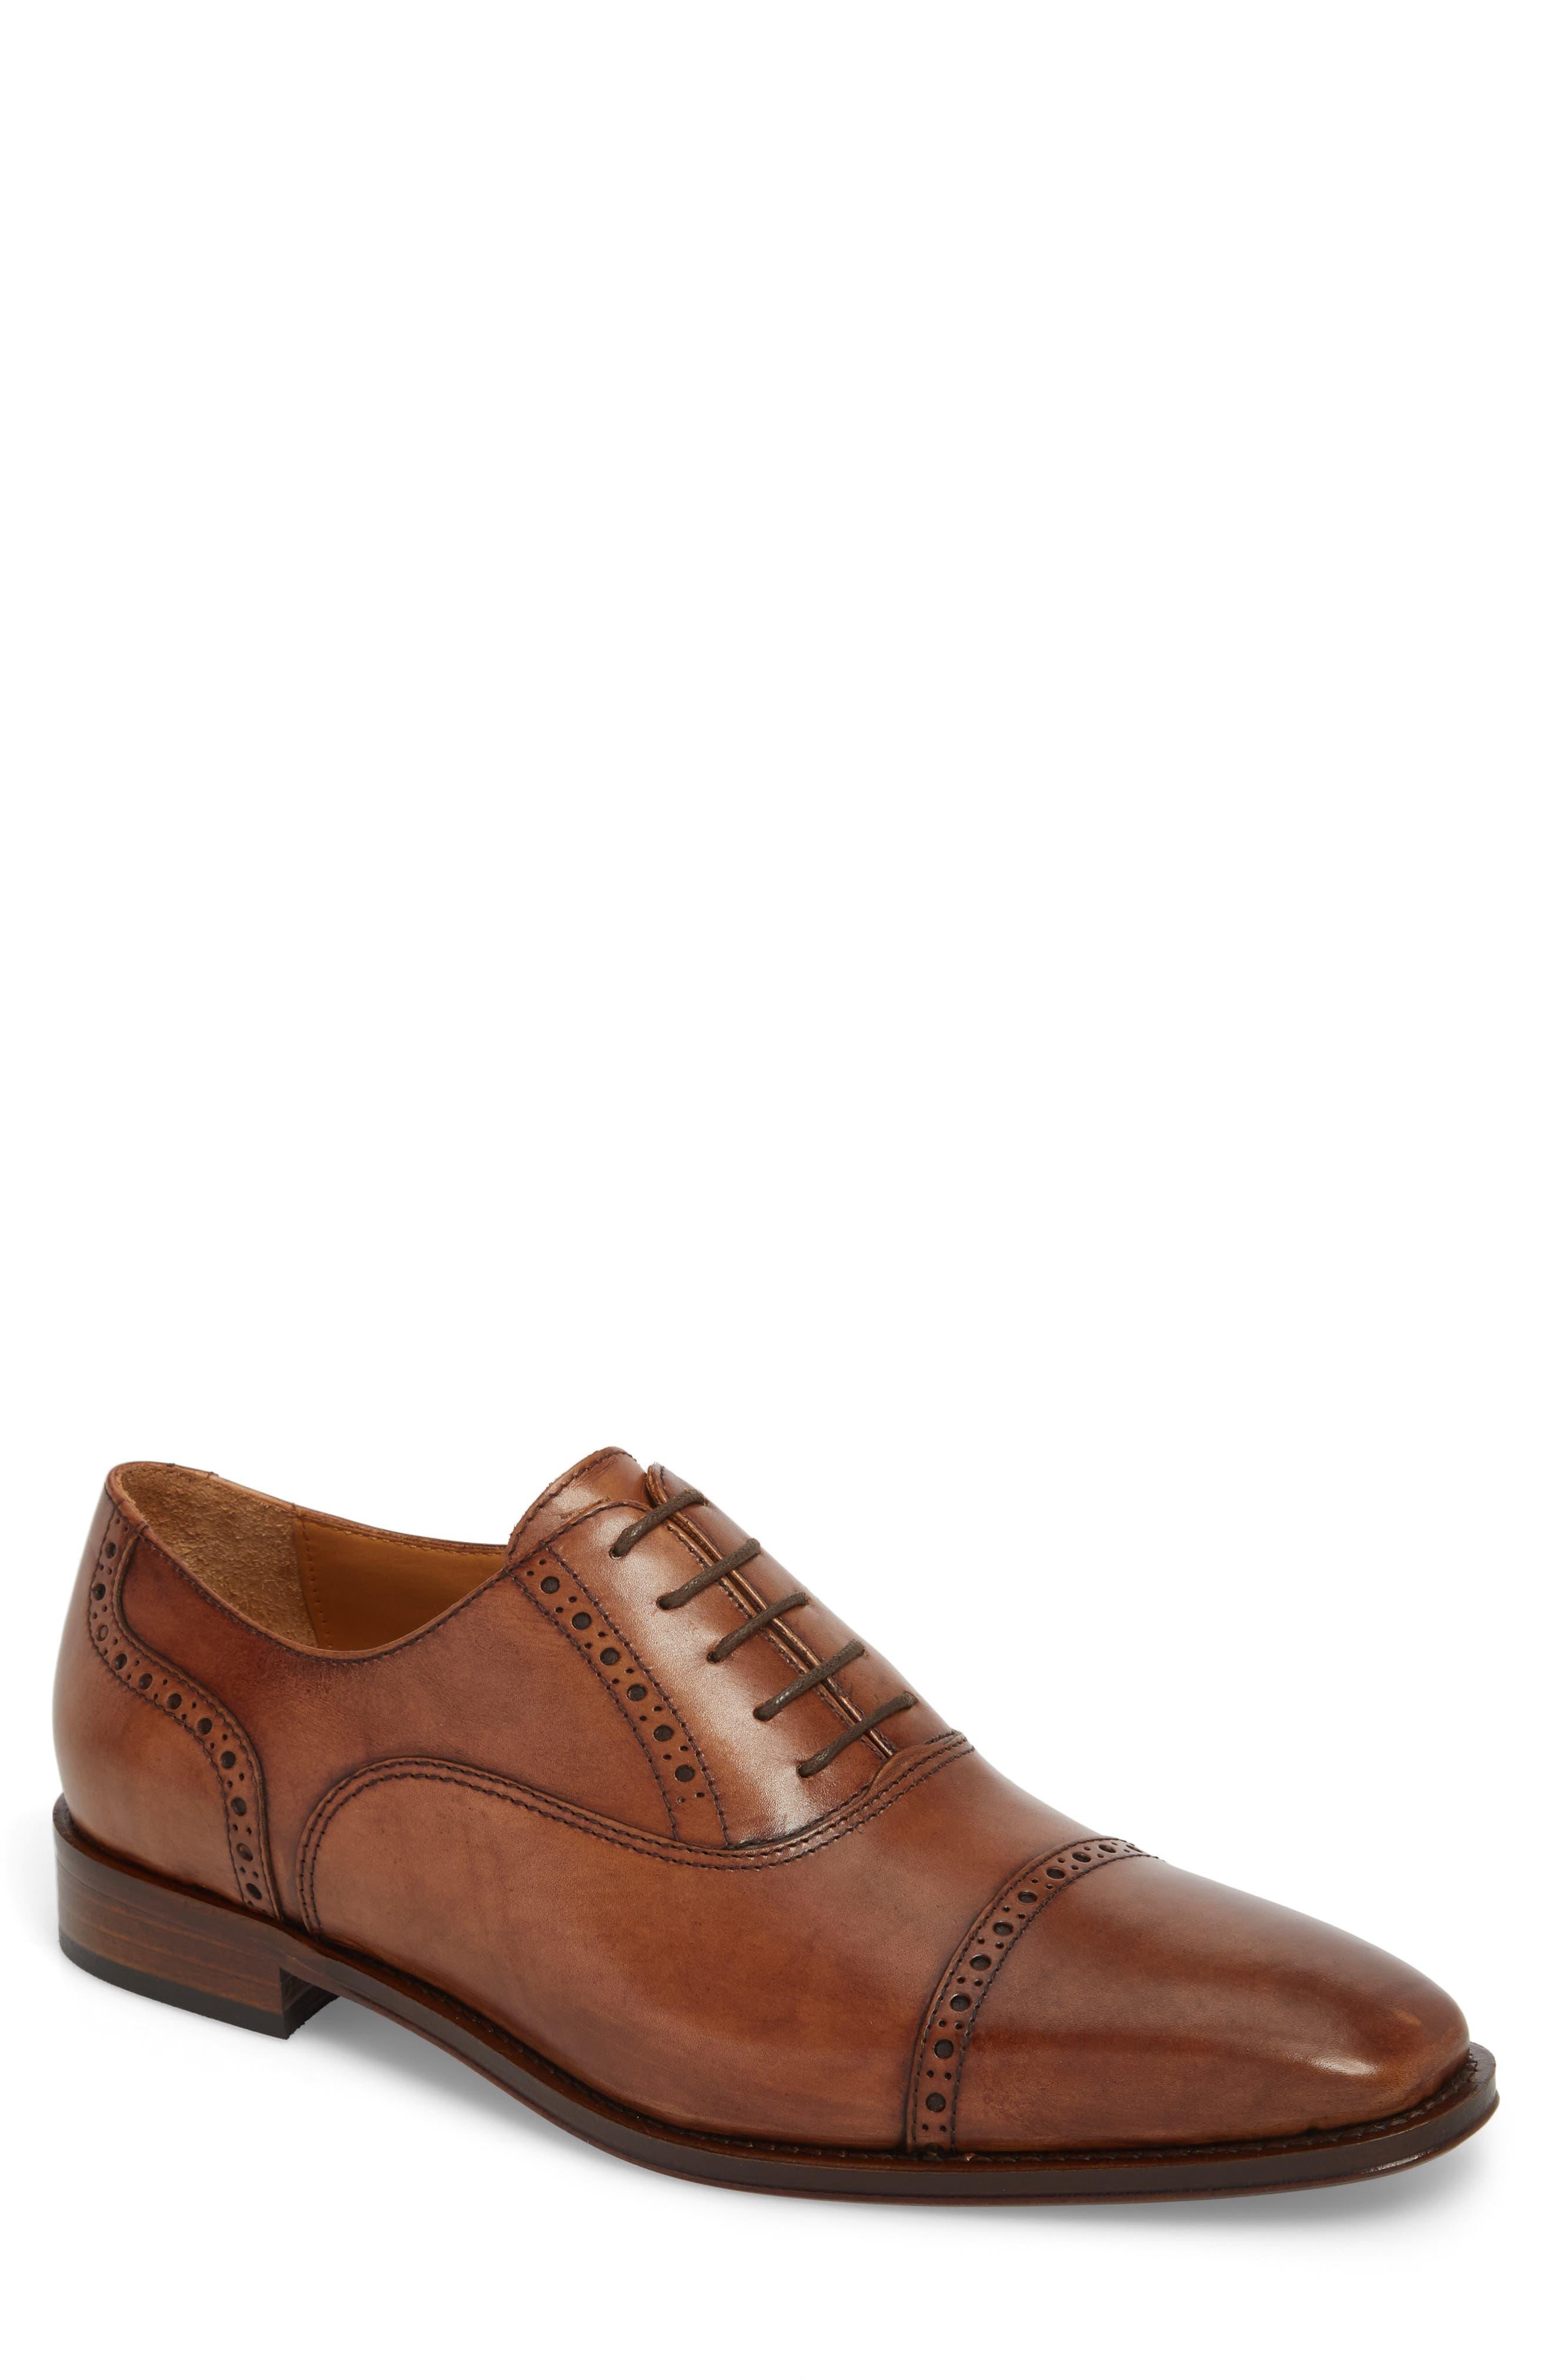 John W. Nordstrom® Vicente Cap toe Loafer (Men)